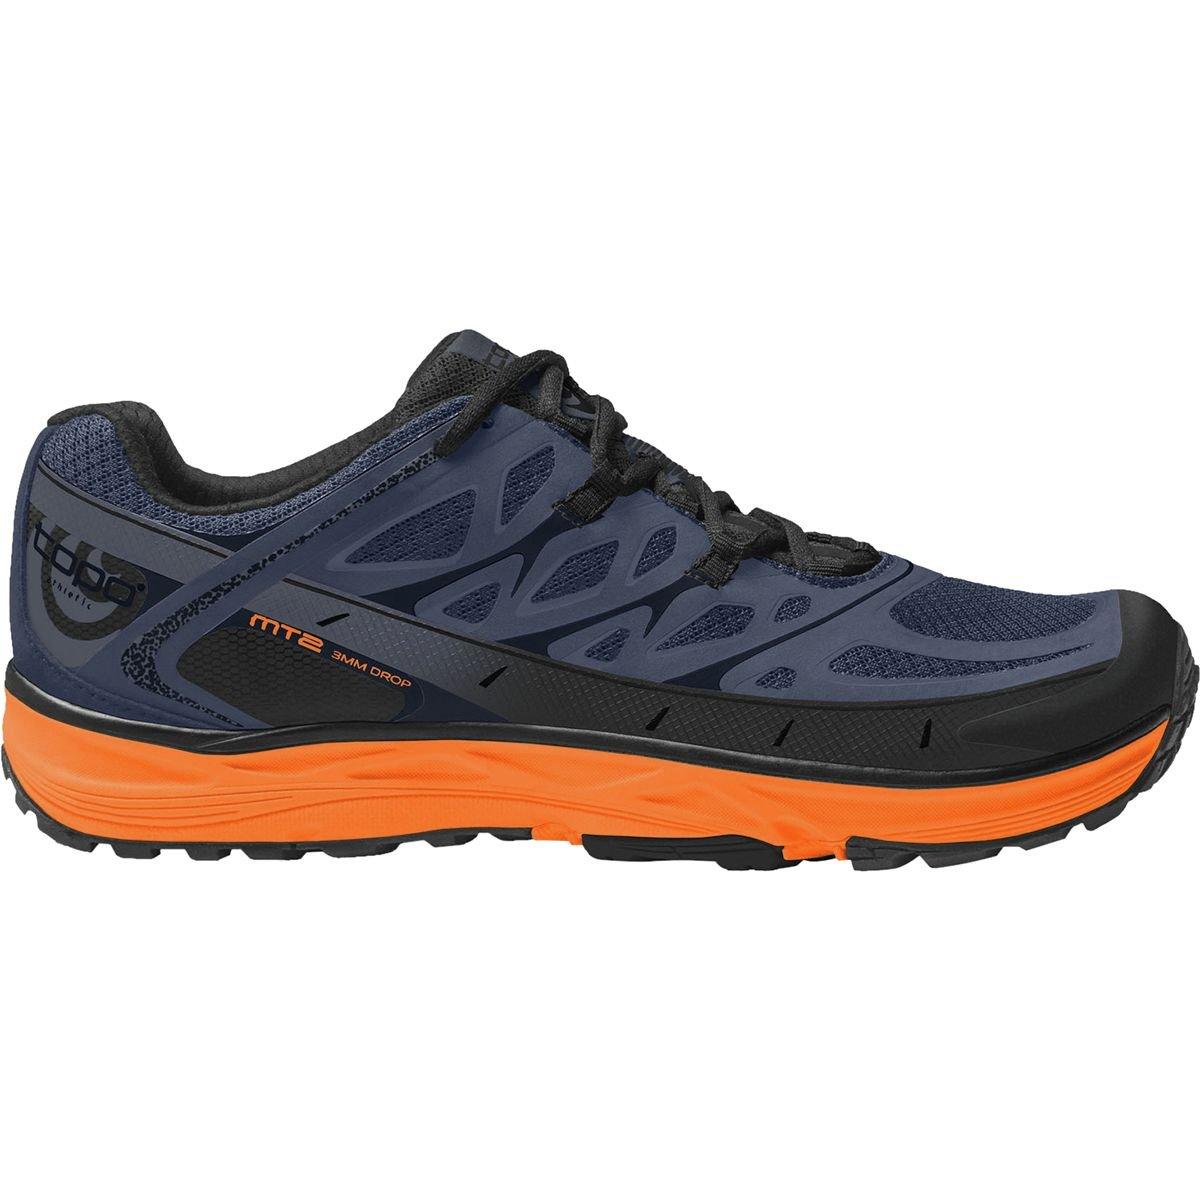 Topo Athletic mt2 Running Shoe – Men 's B07CGHWH9B 10.5 D(M) US Blue/Mango